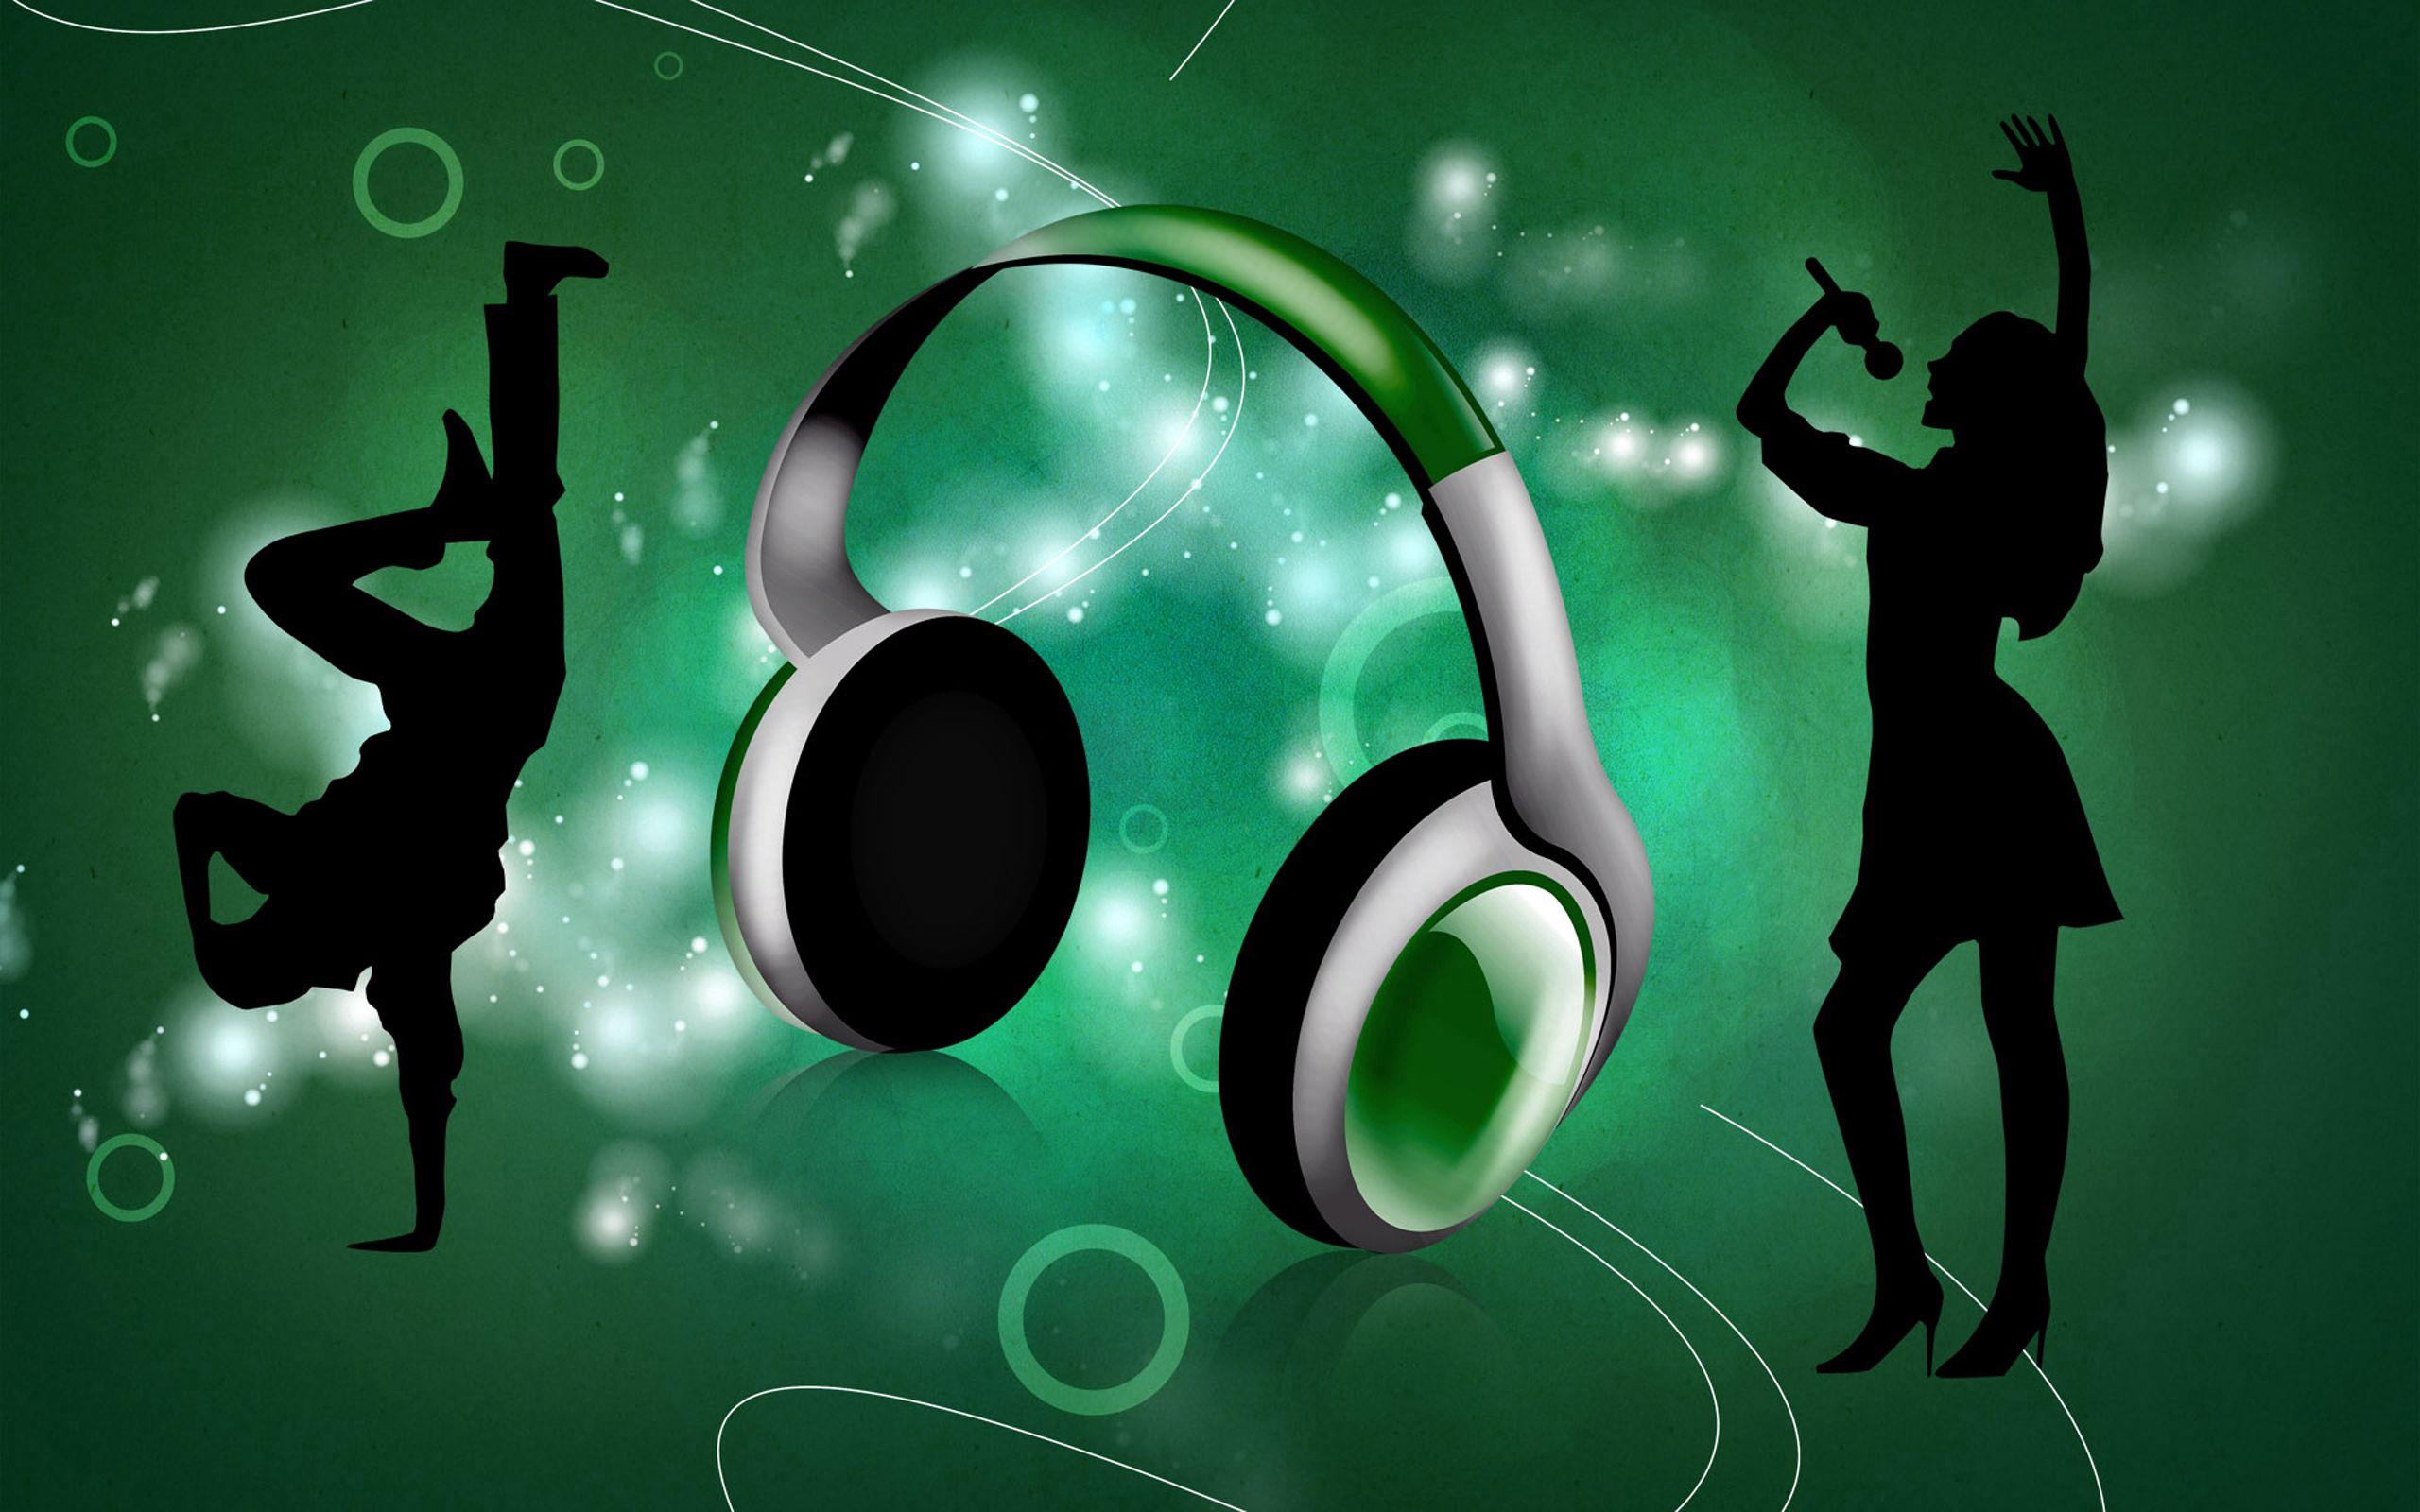 137520 Screensavers and Wallpapers Guy for phone. Download Headphones, Dance, Vector, Girl, Singer, Guy, Brakedance, Break Dance pictures for free